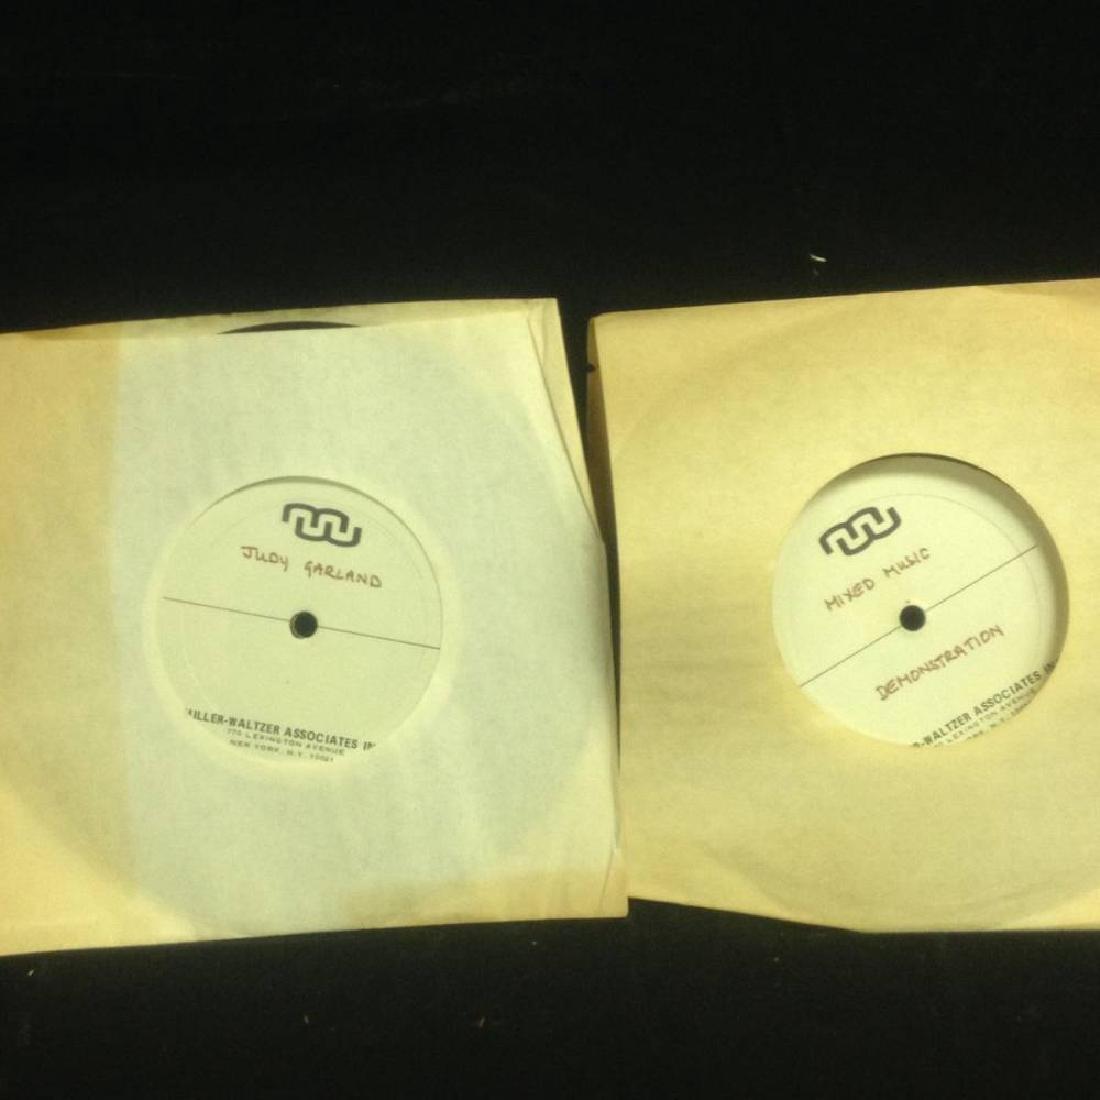 Pair Of Demo Records Judy Garland And Mixed Music